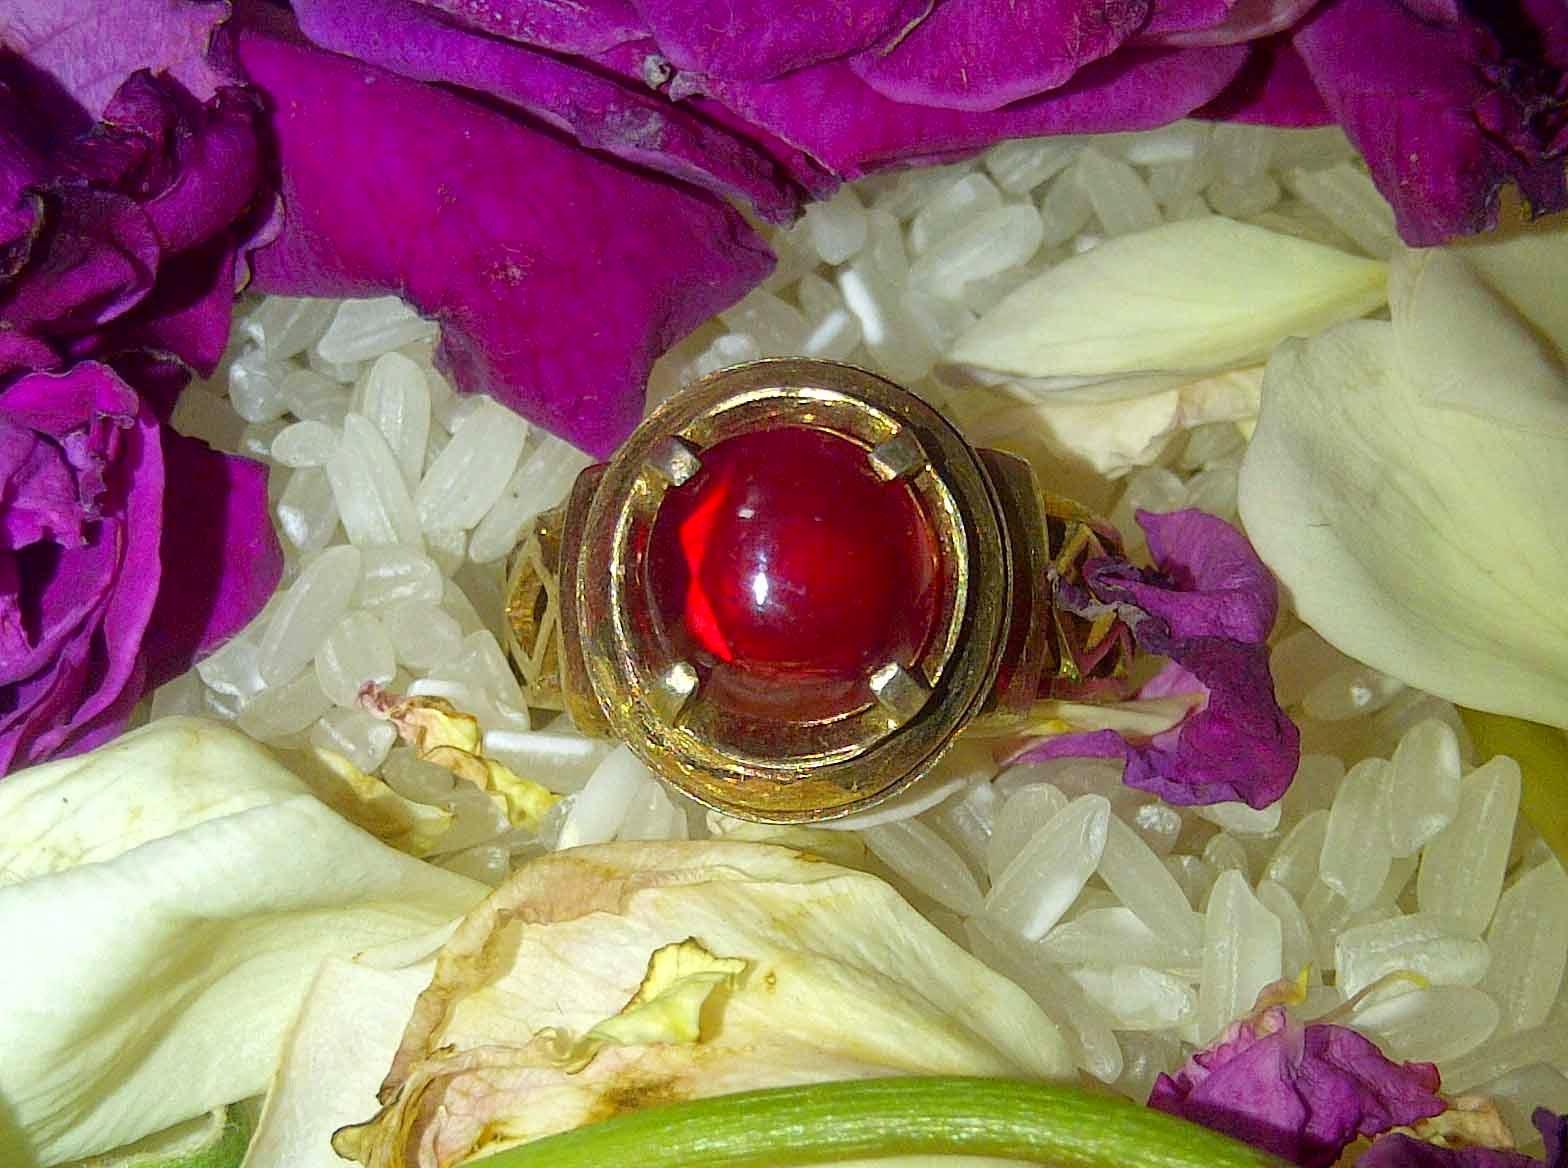 Cara Mendapatkan Batu Merah Delima, Mustika, Cincin Dan